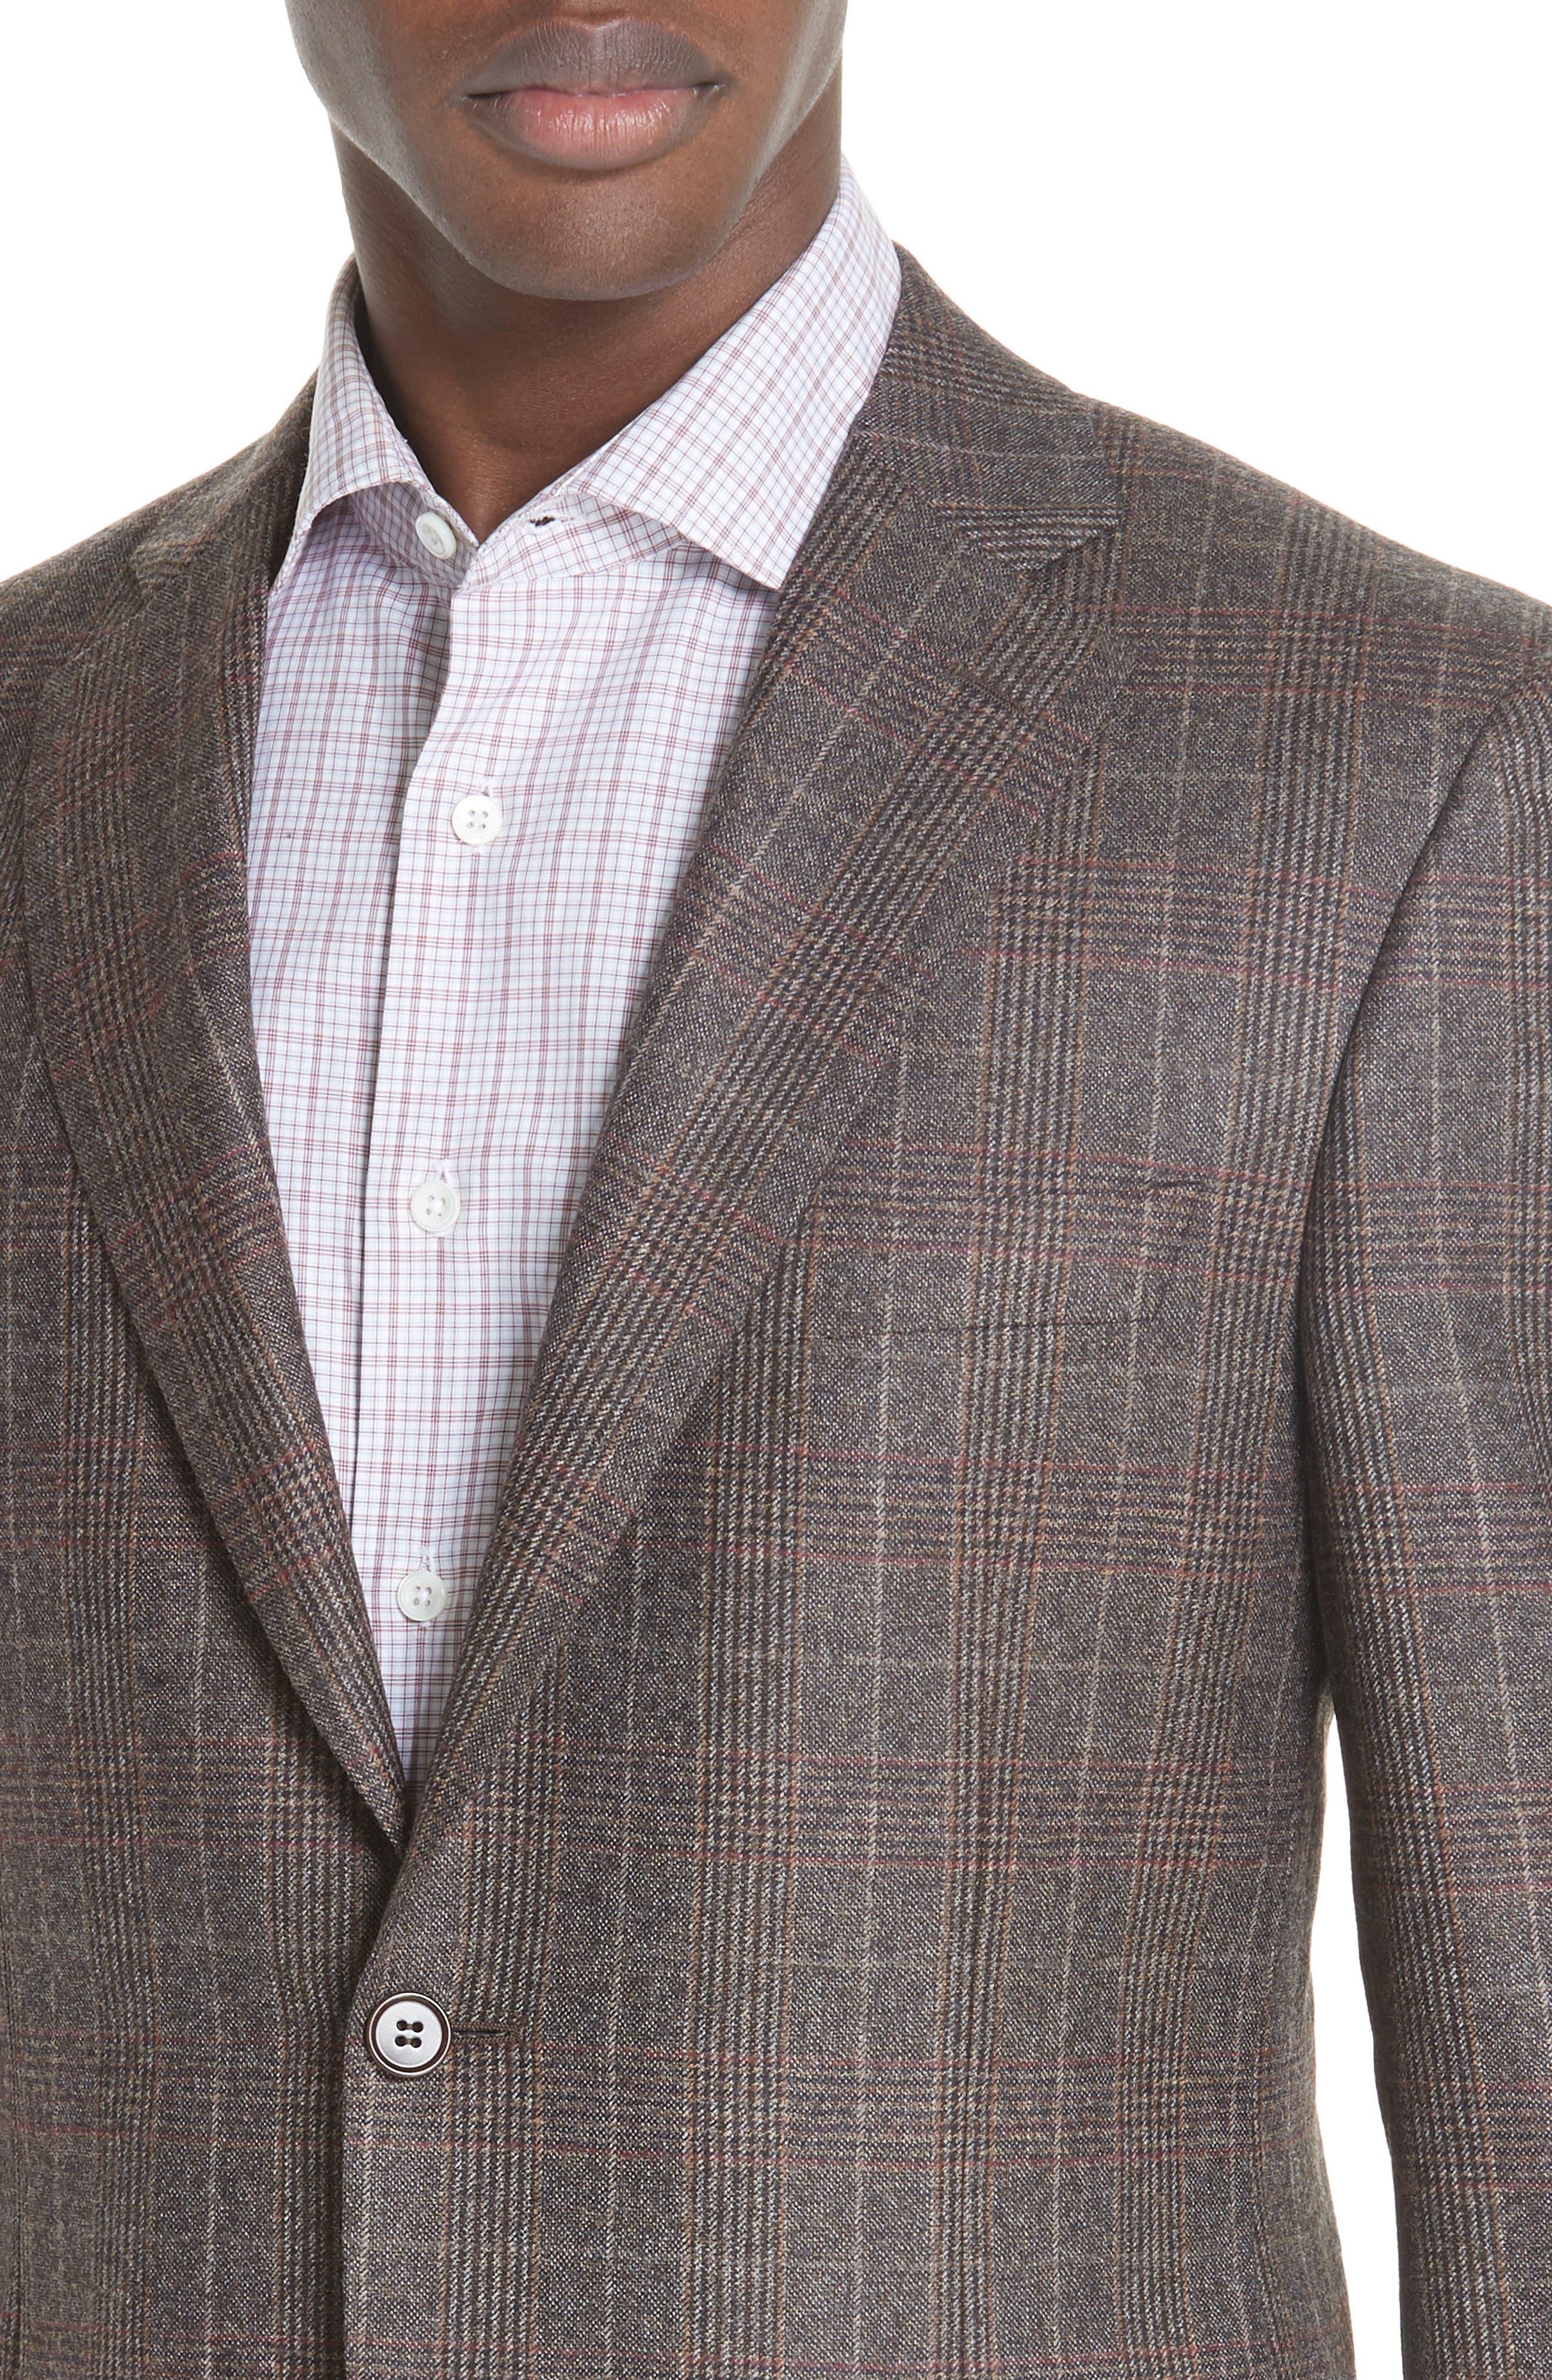 CANALI,                             Classic Fit Plaid Wool Sport Coat,                             Alternate thumbnail 4, color,                             200